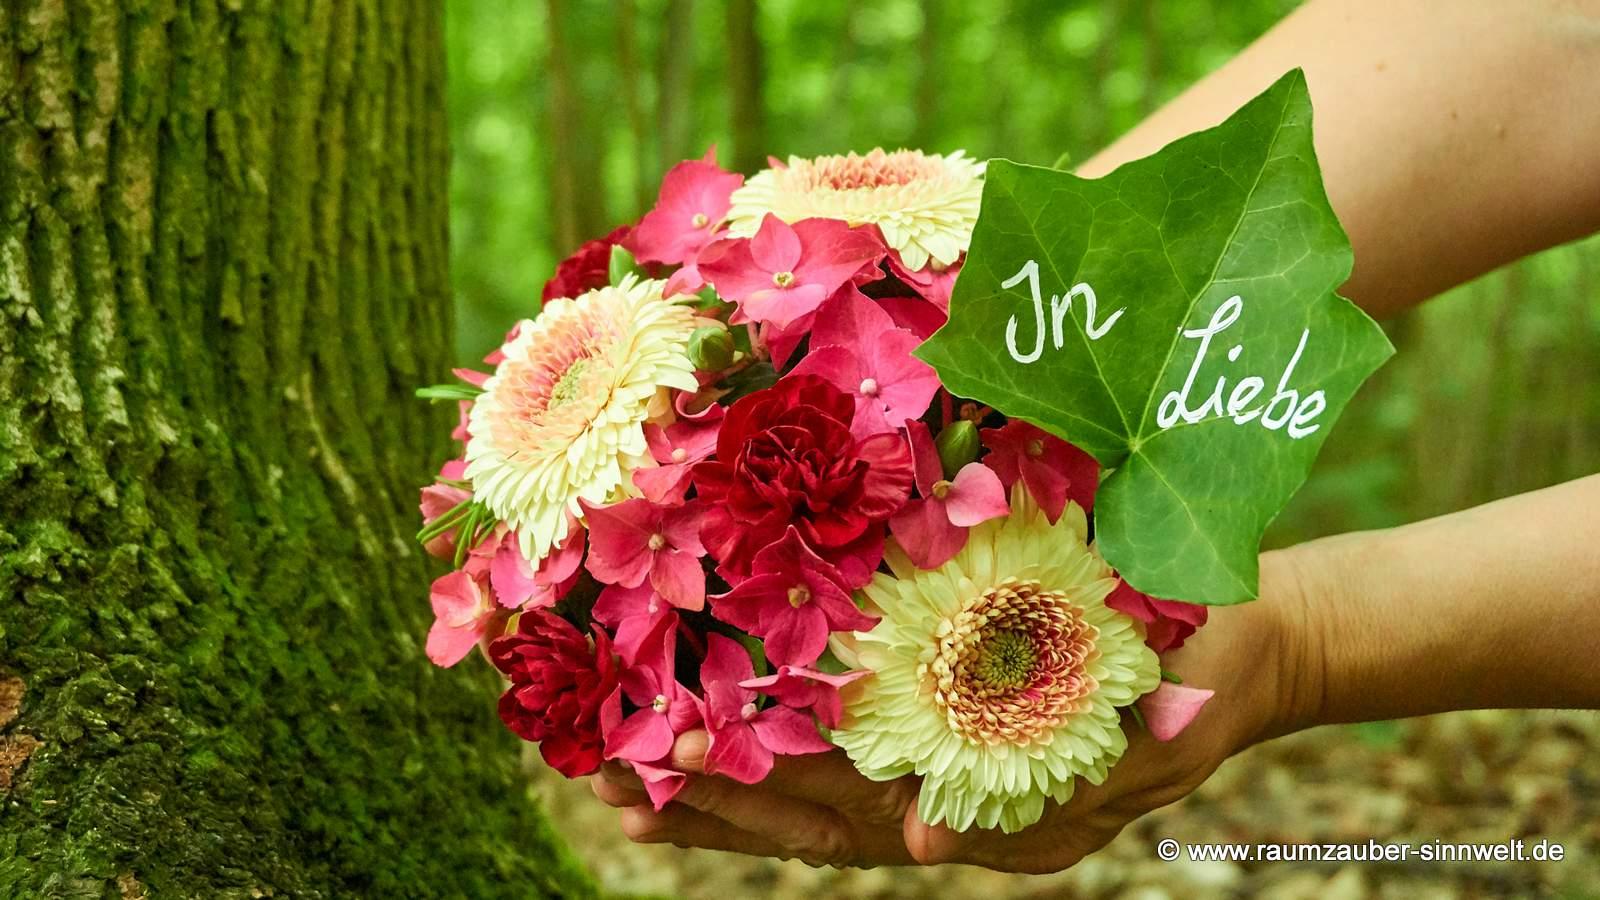 Blütenkugel für den Friedwald aus Hortensien und Gerbera mit beschriebenem Blatt.